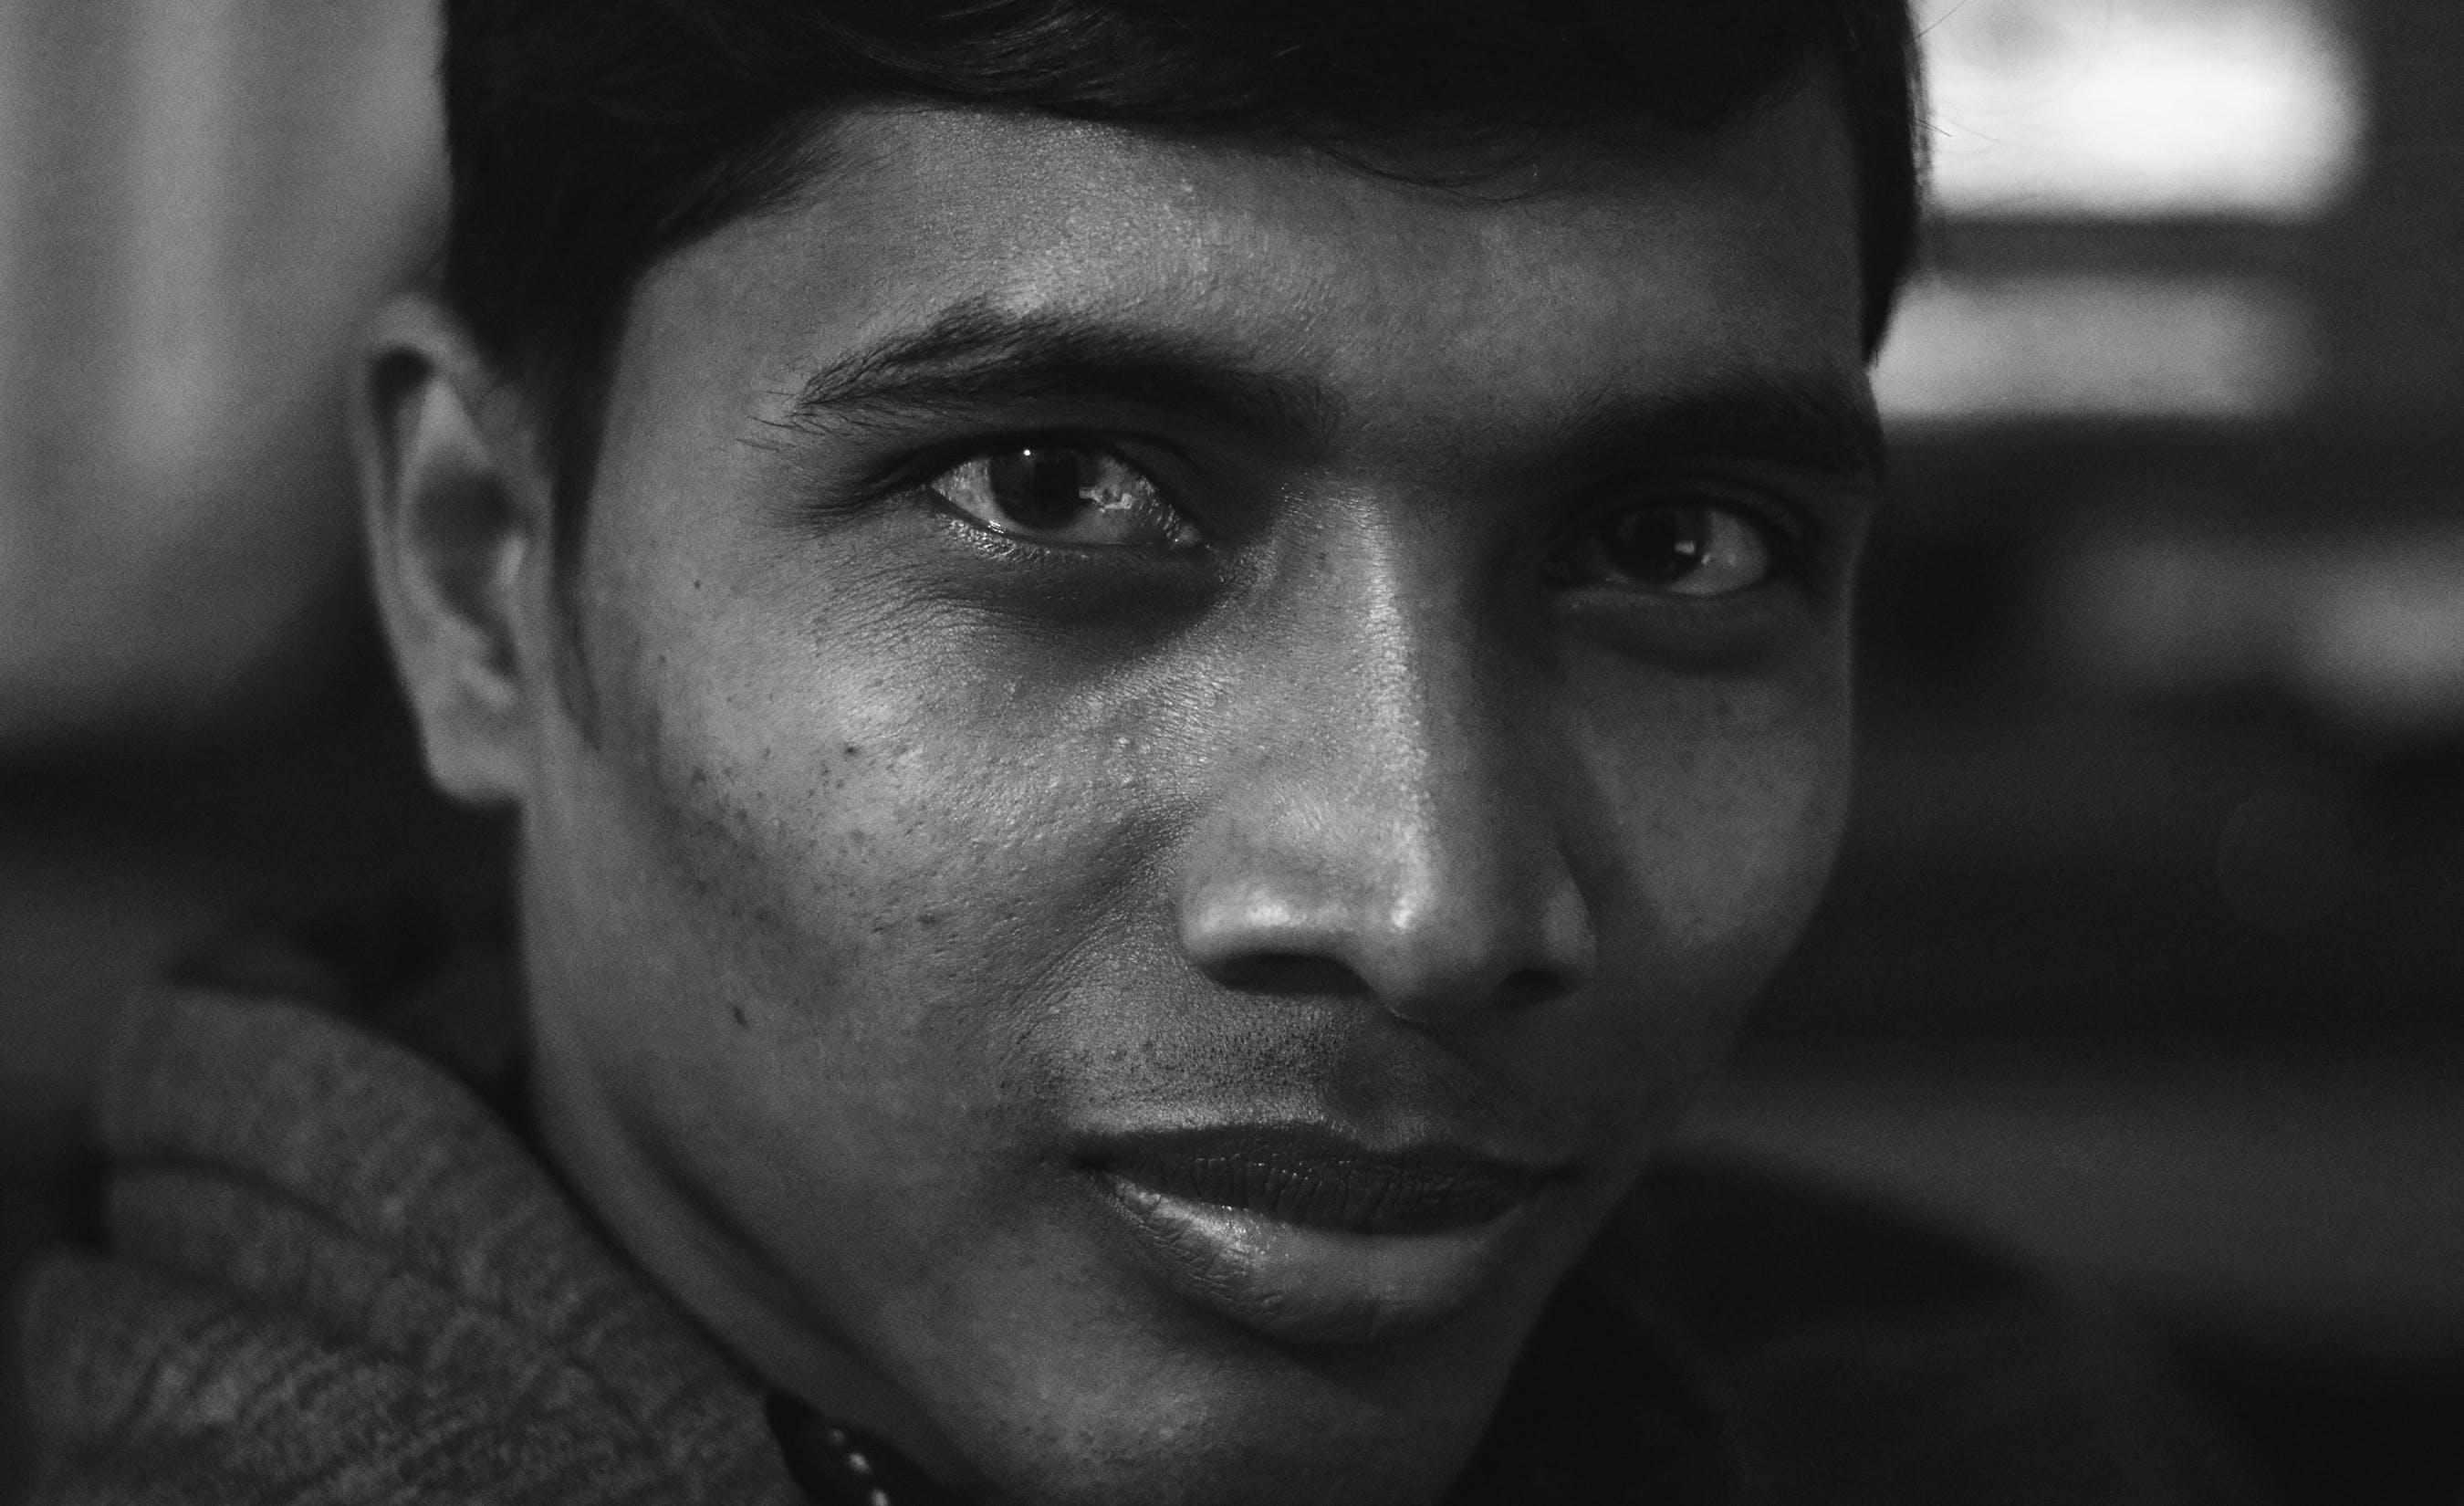 Free stock photo of angry, black, blur, dark